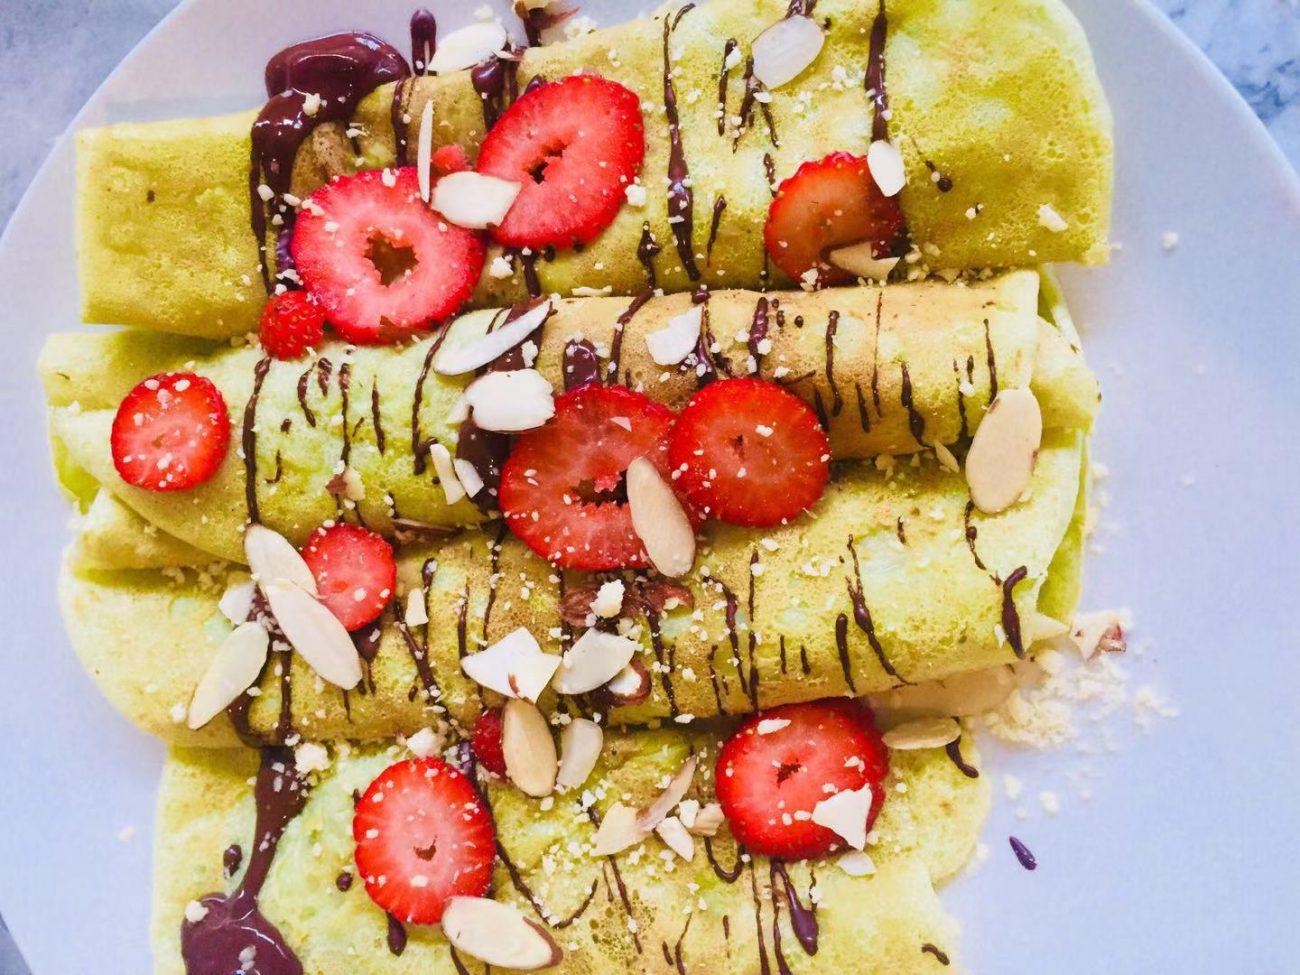 Vegan Chocolate Strawberry/Banana crepe recipe (No Sugar, No Oil)